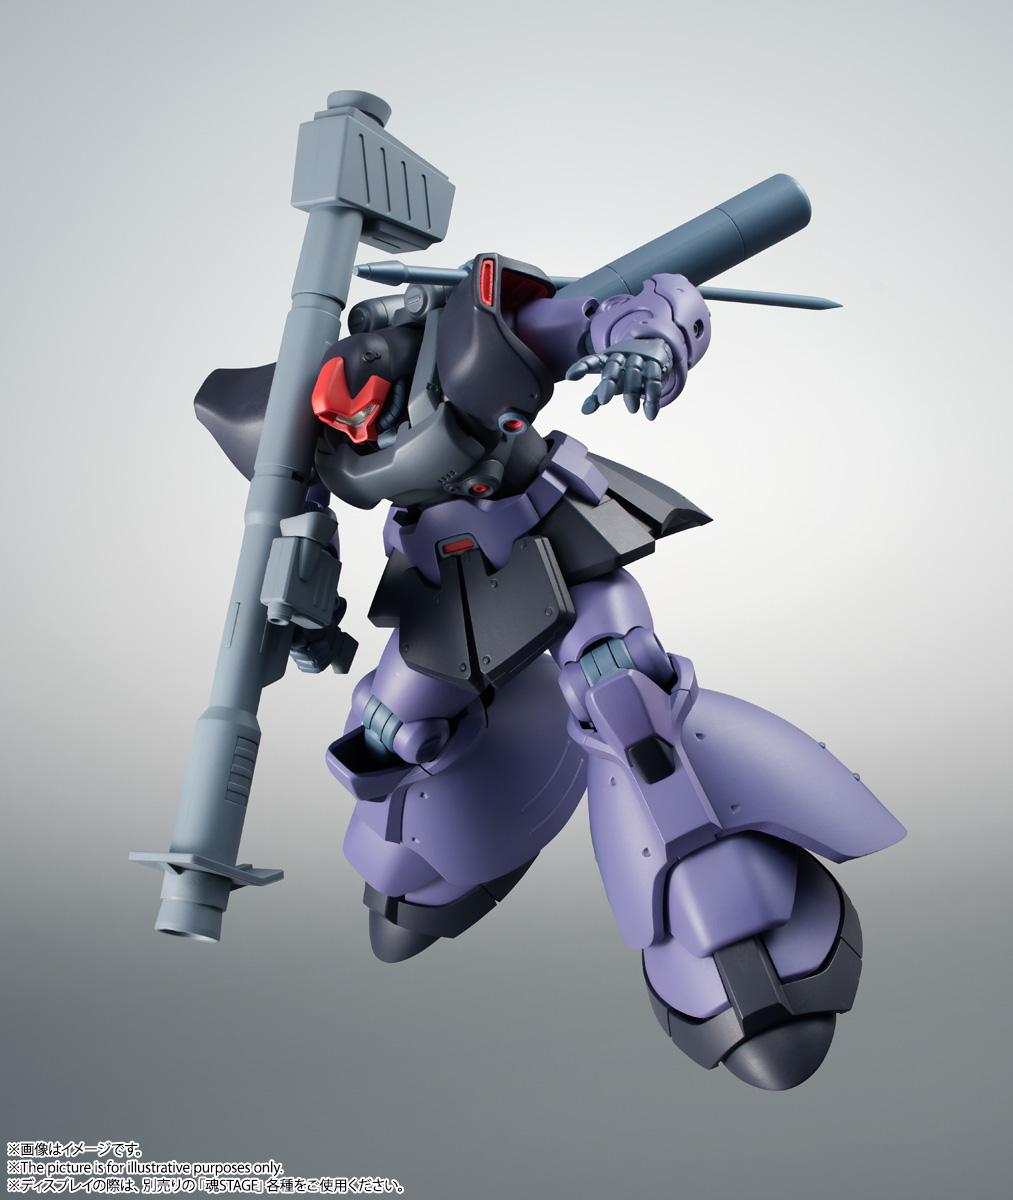 ROBOT魂〈SIDE MS〉『MS-09R-2 リック・ドムⅡ ver. A.N.I.M.E.』機動戦士ガンダム0083 可動フィギュア-007